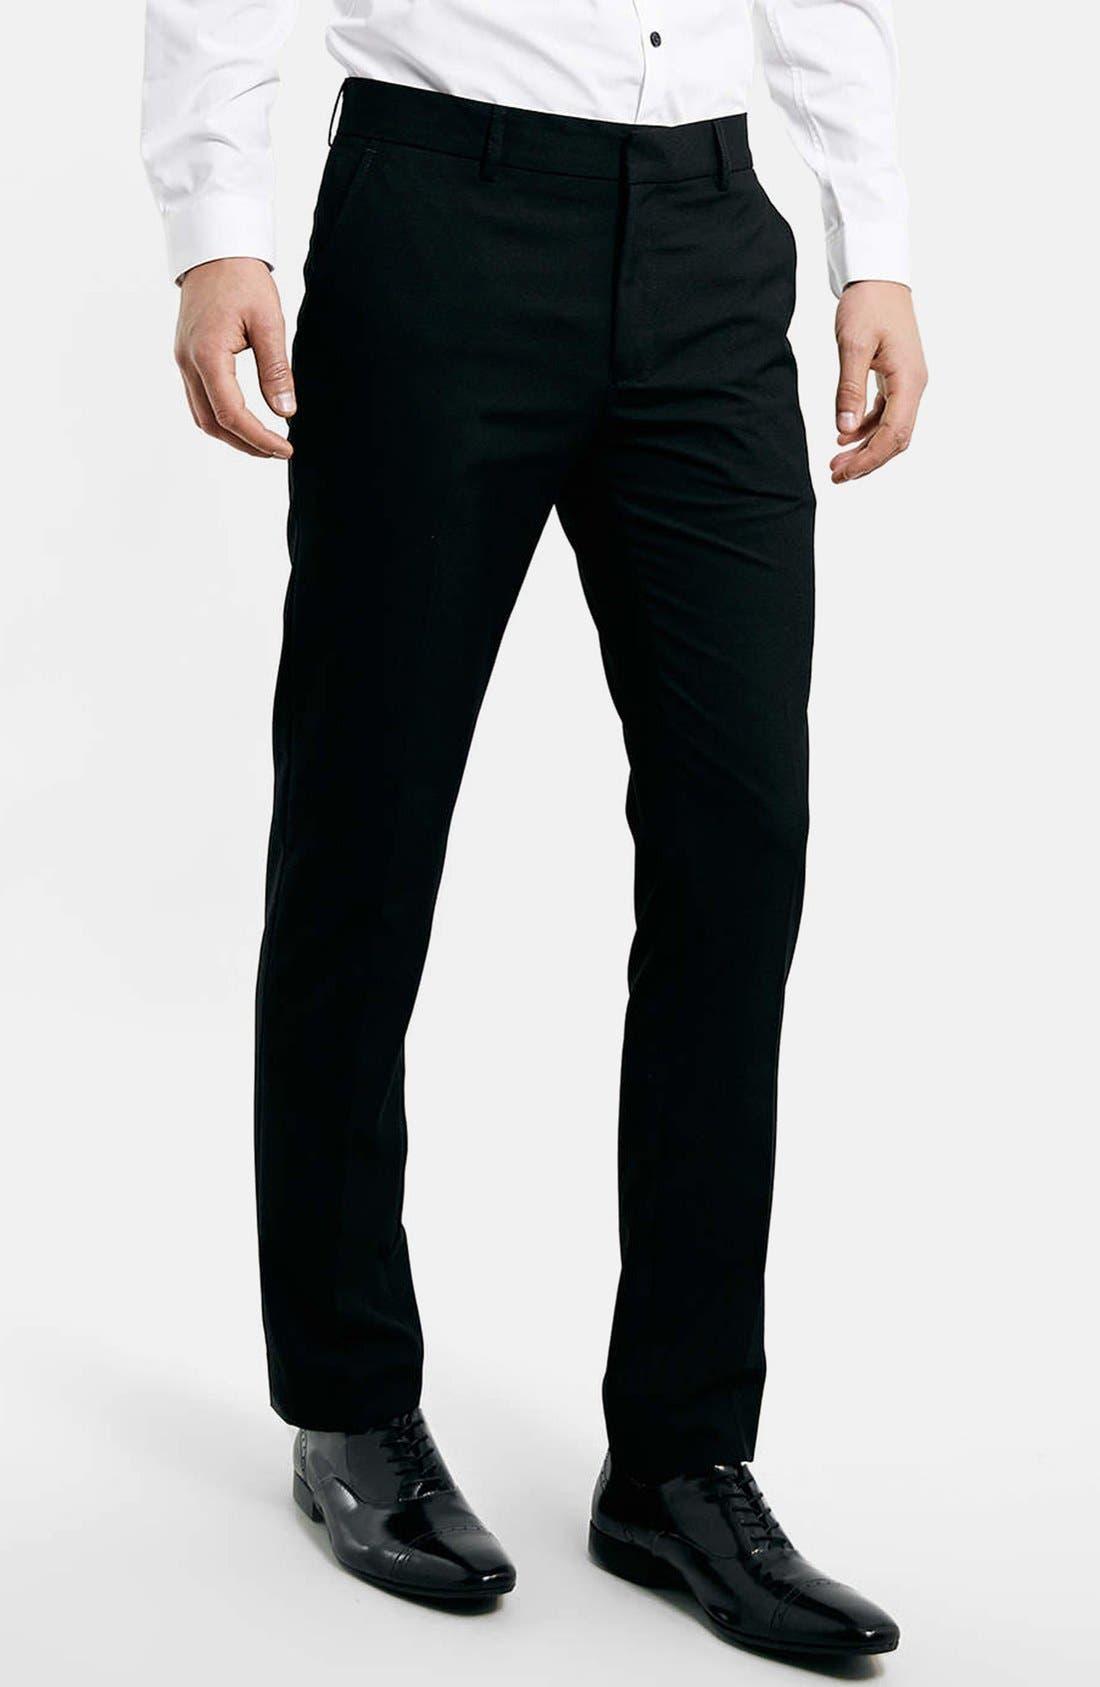 Black Skinny Fit Trousers,                             Main thumbnail 1, color,                             001